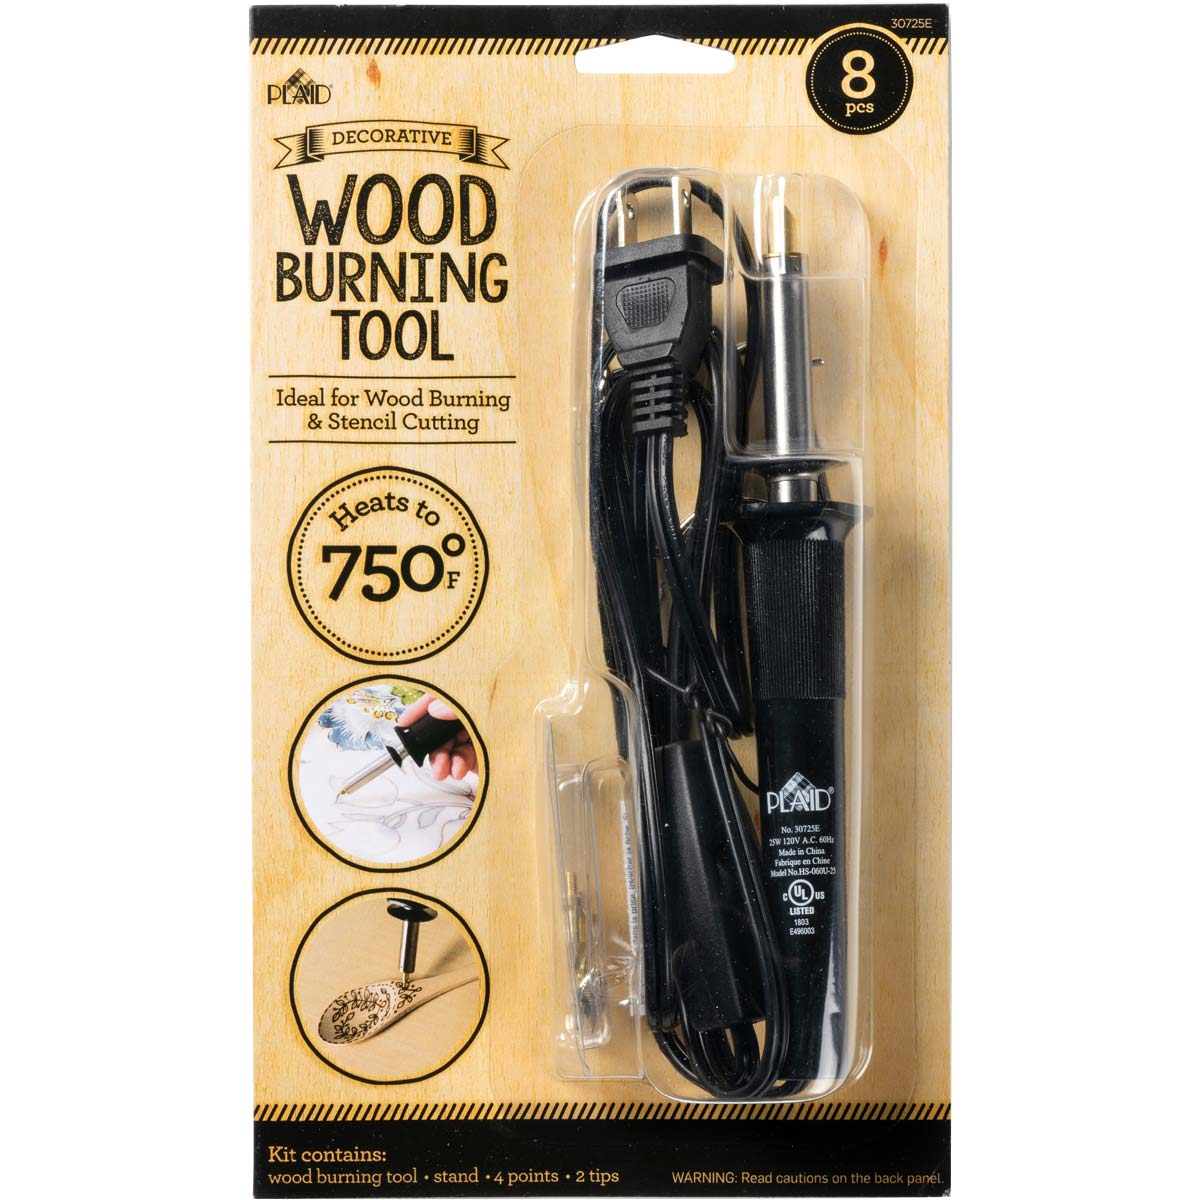 Plaid ® Decorative Wood Burning Tool - 30725